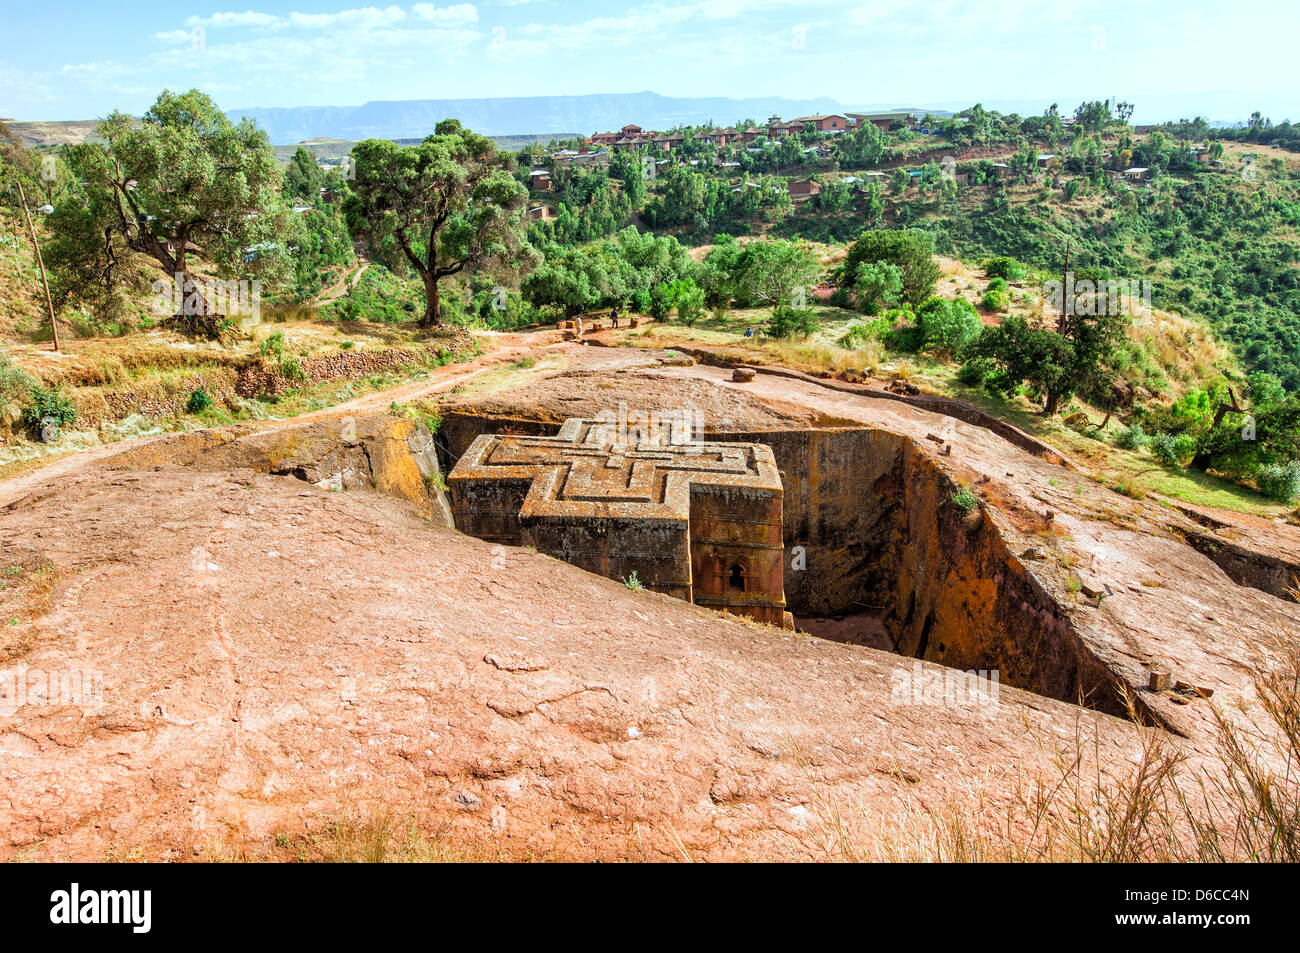 Lalibela, Amhara region, Northern Ethiopia - Stock Image